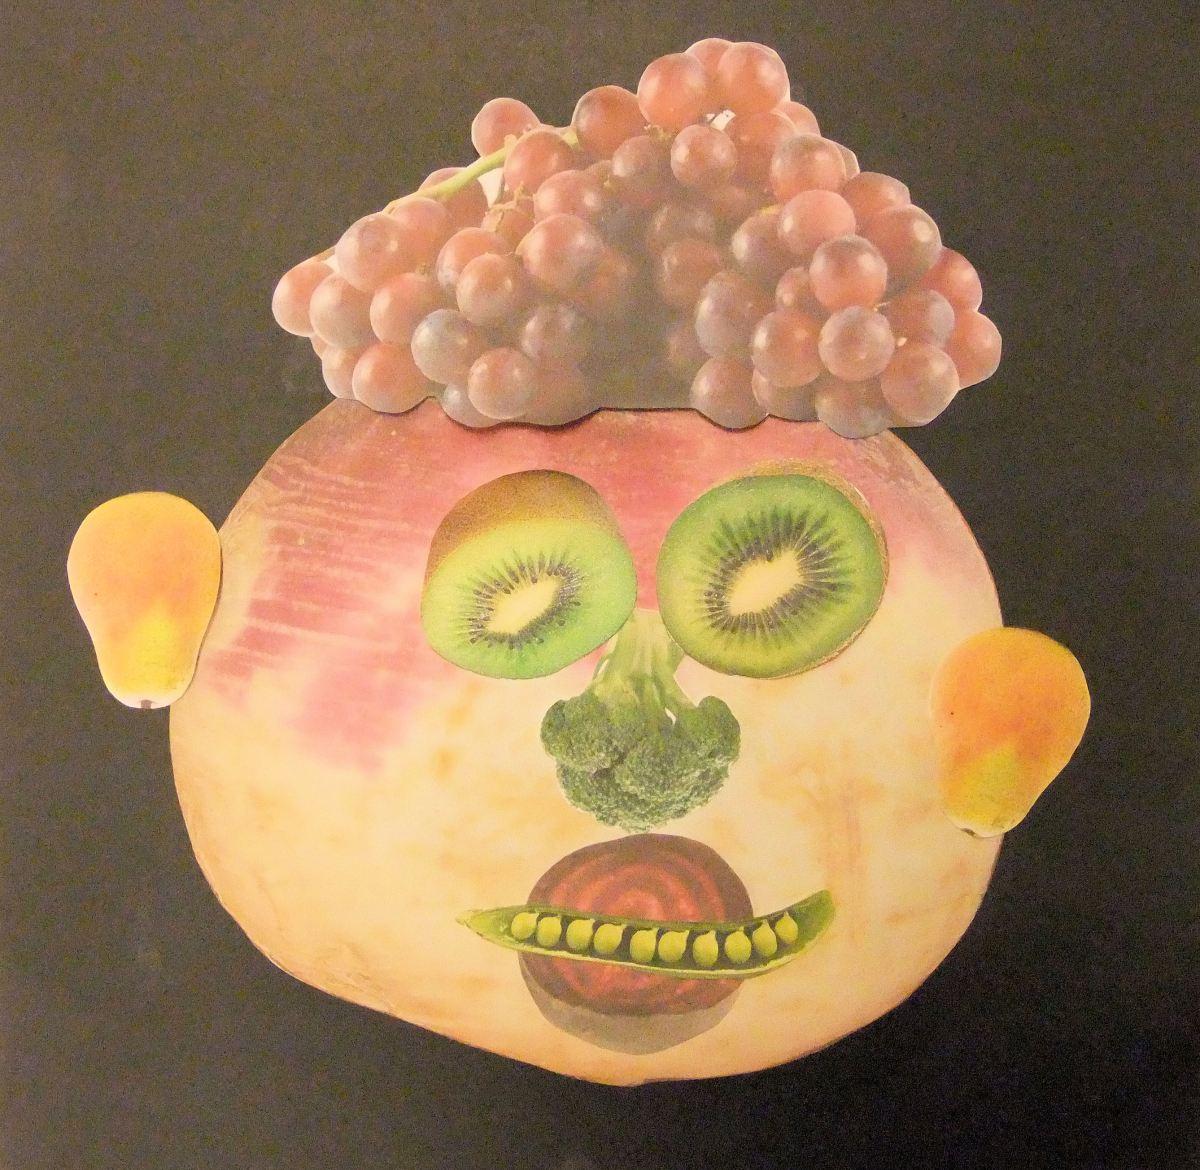 Fruit And Vegetable Faces Inspired Arcimboldo November 2013 Hannah' Art Club